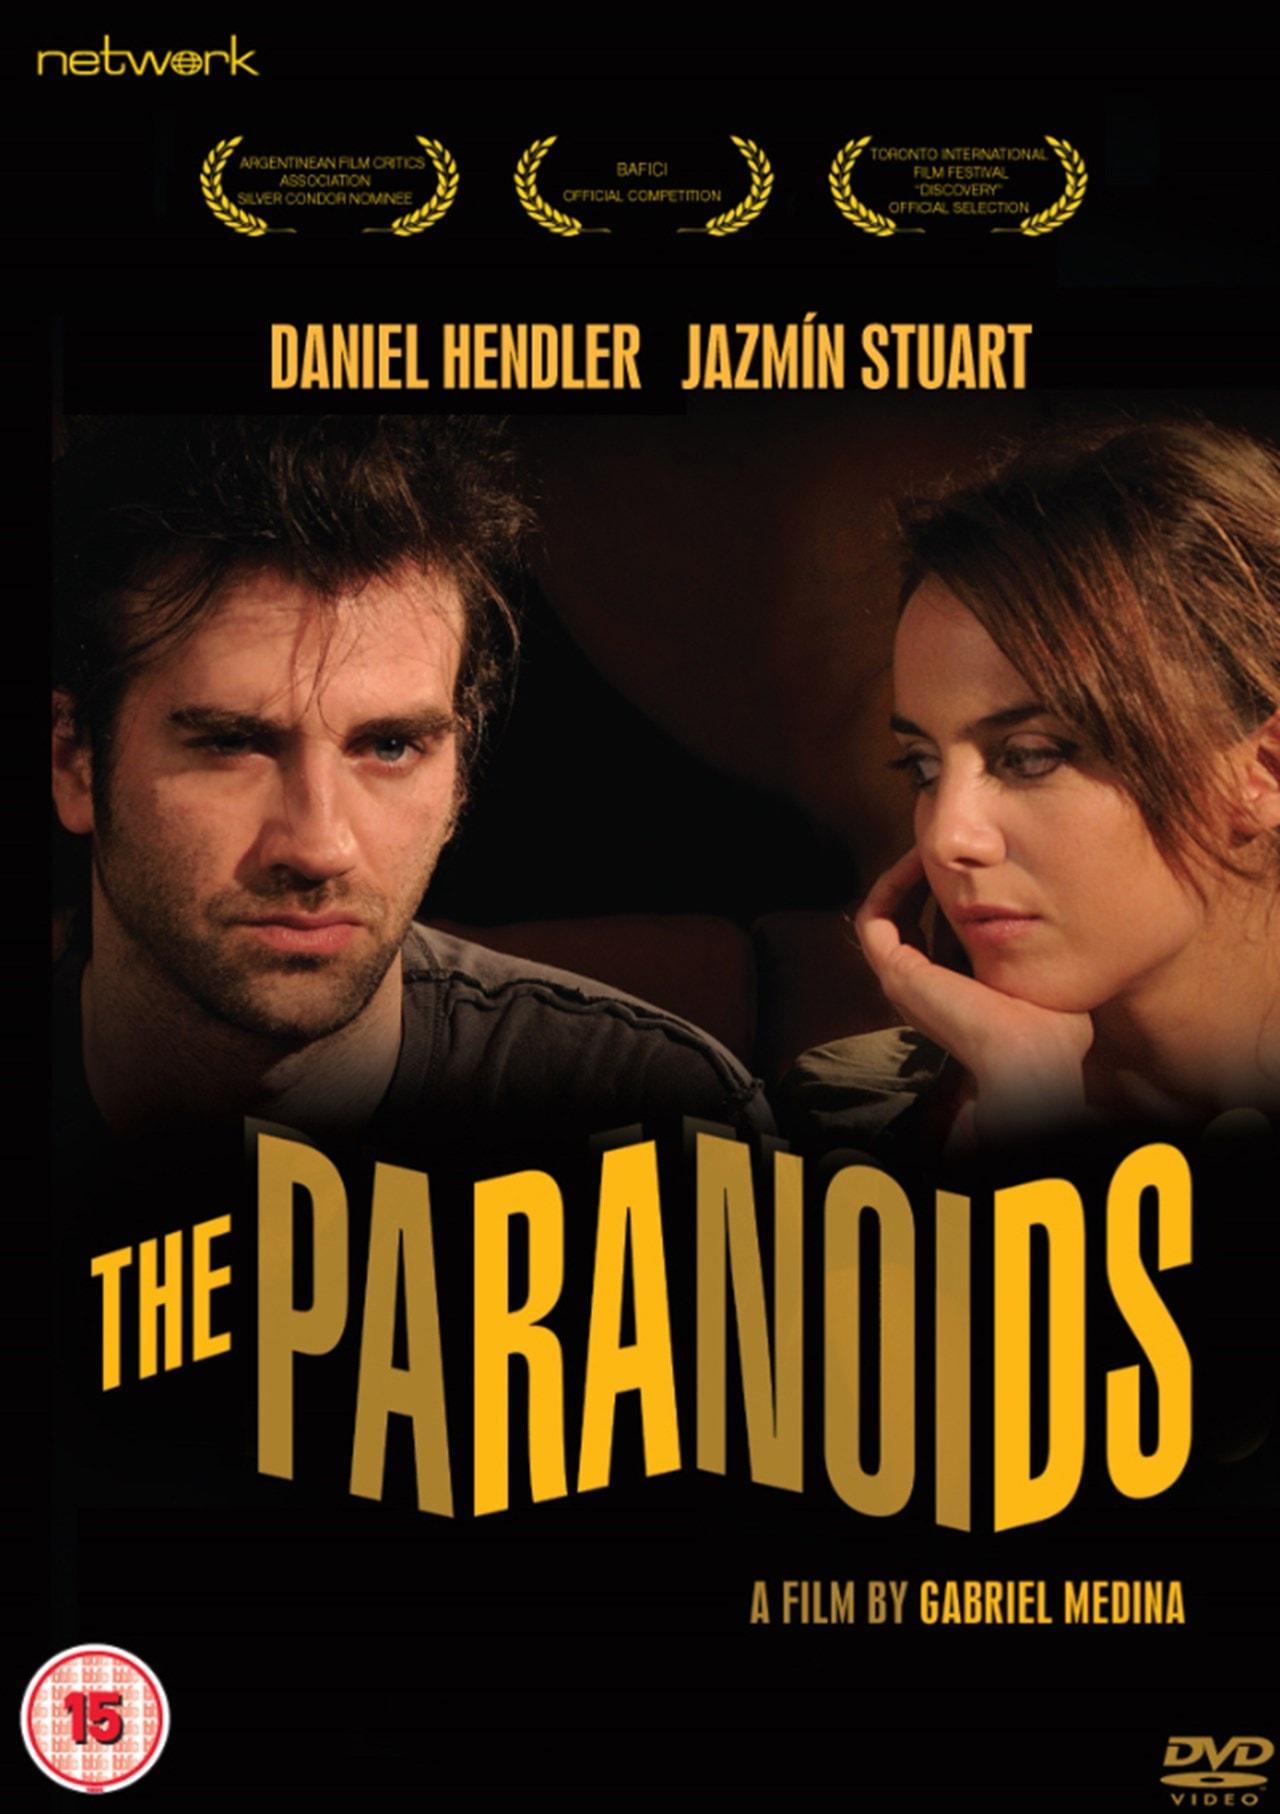 The Paranoids - 1